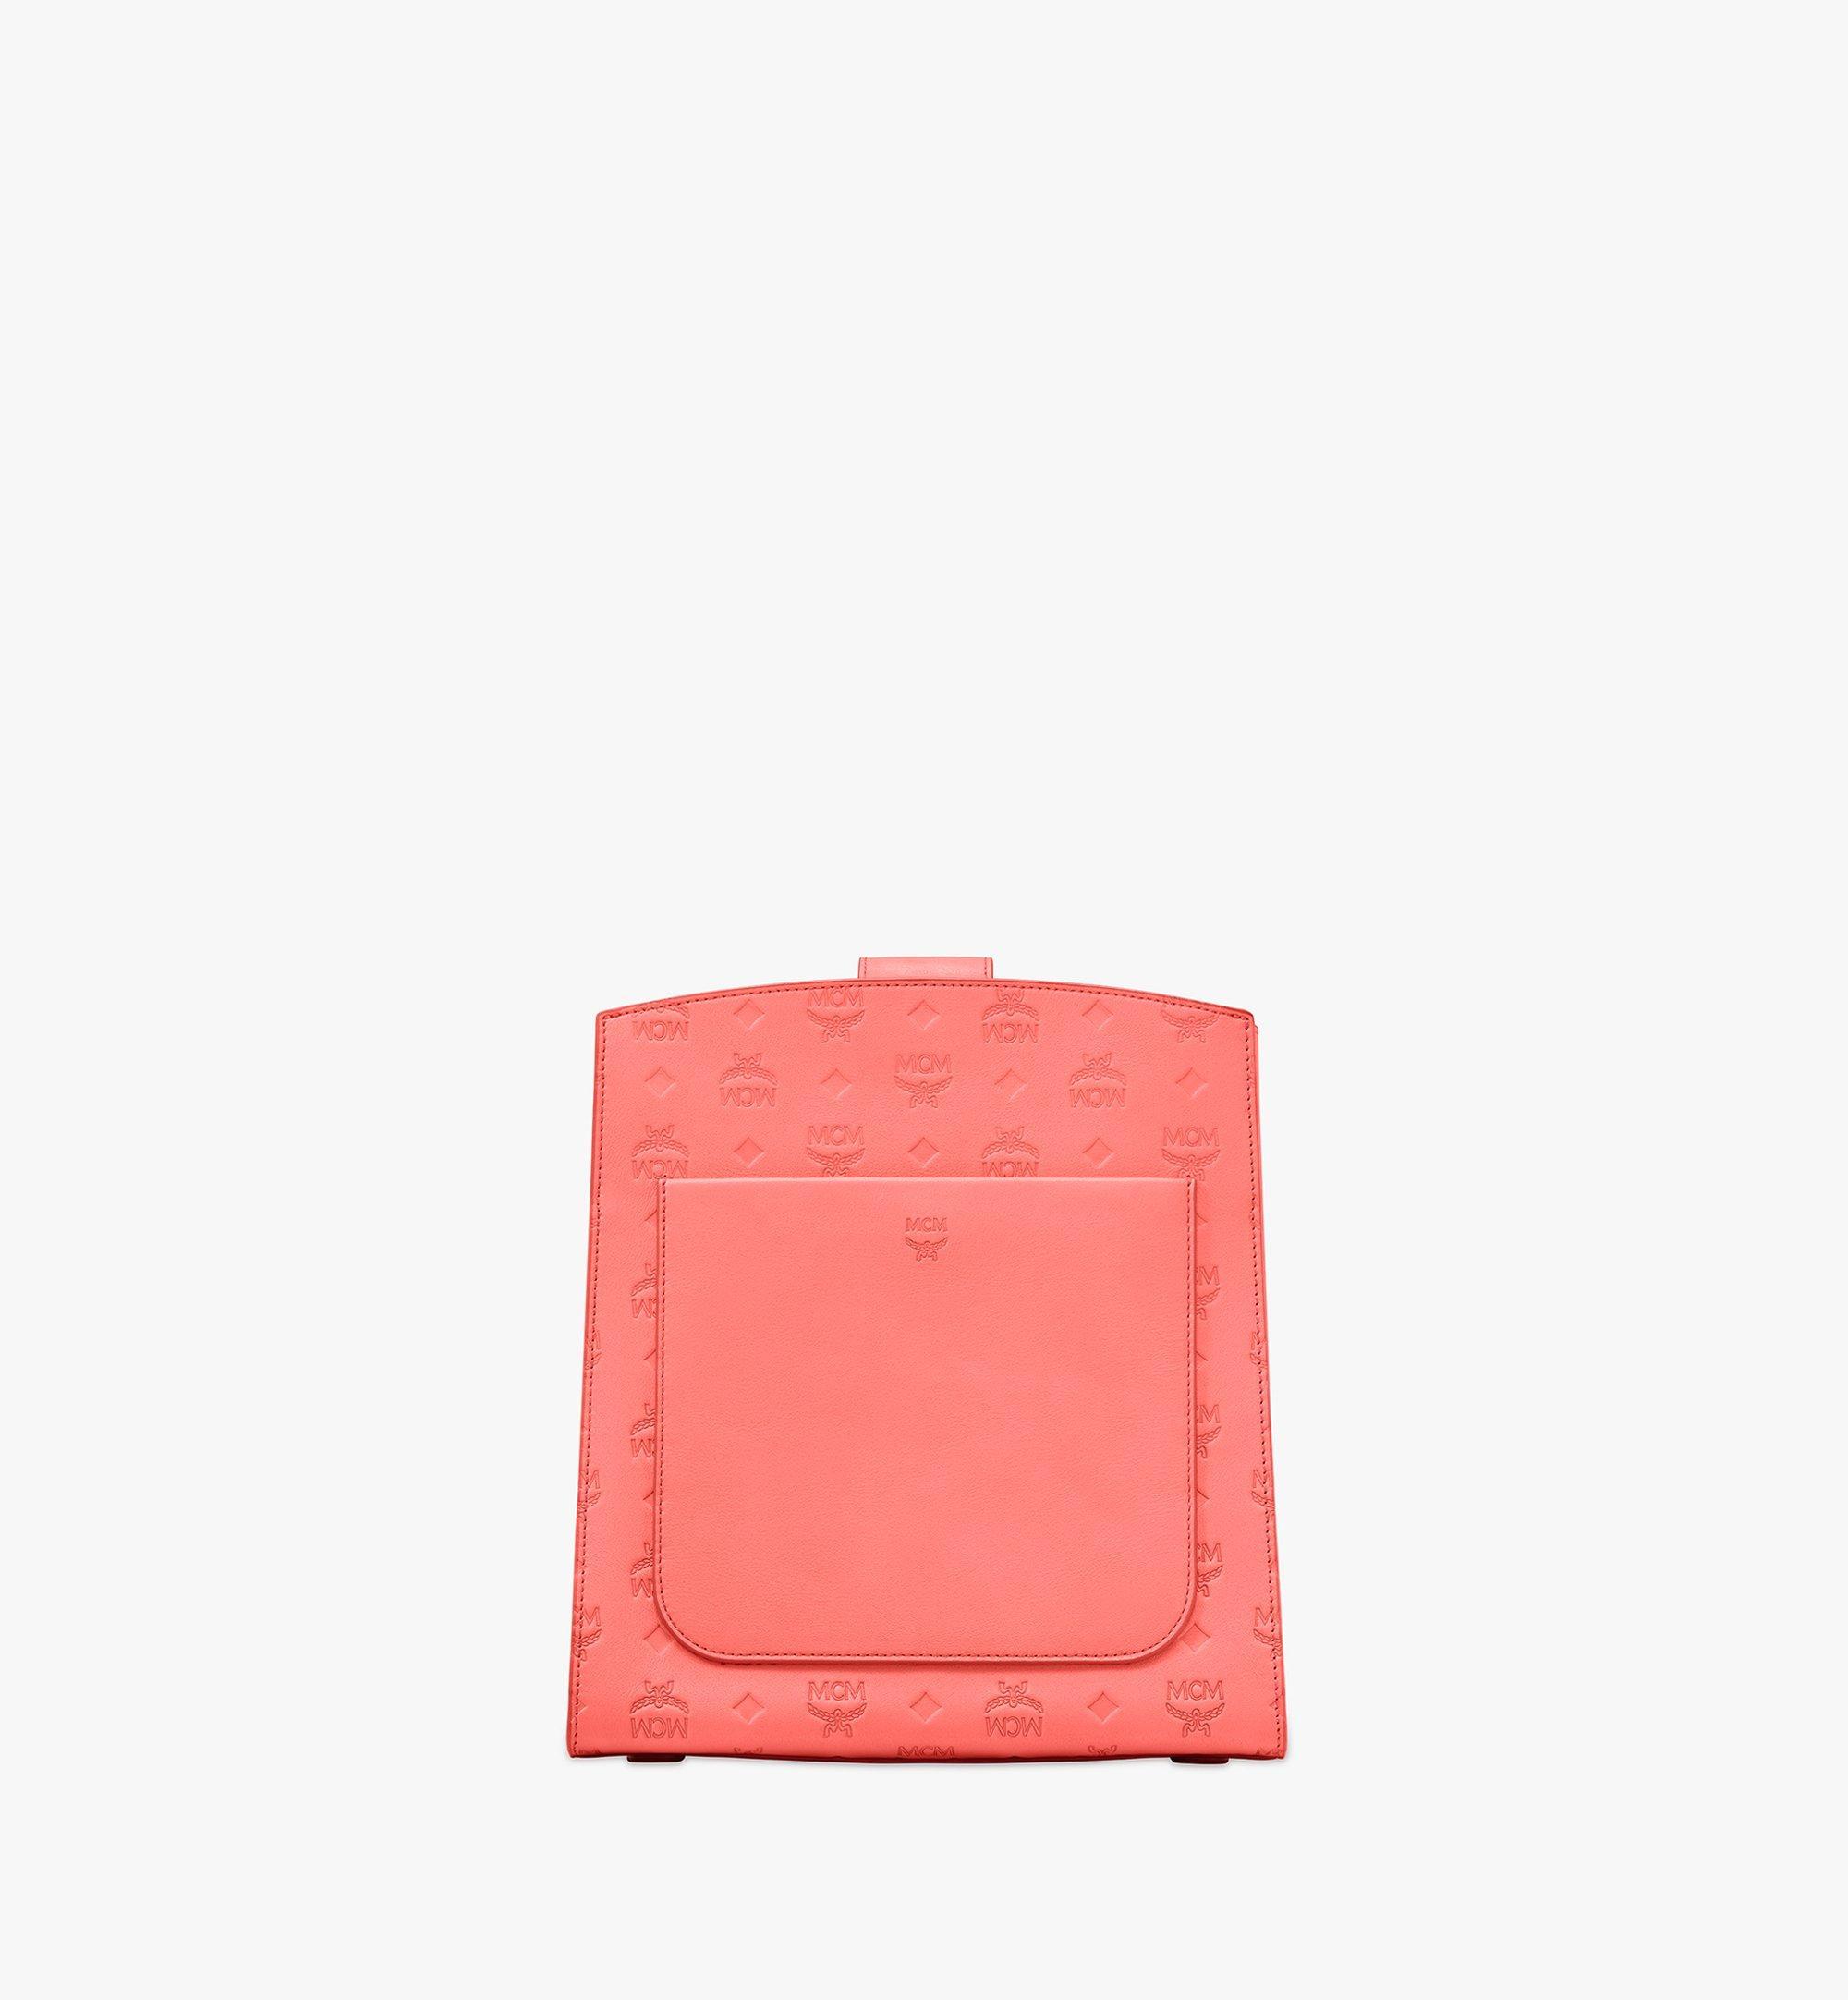 MCM Essential Bucket Bag in Monogram Leather Red MWDASSE04O3001 Alternate View 3